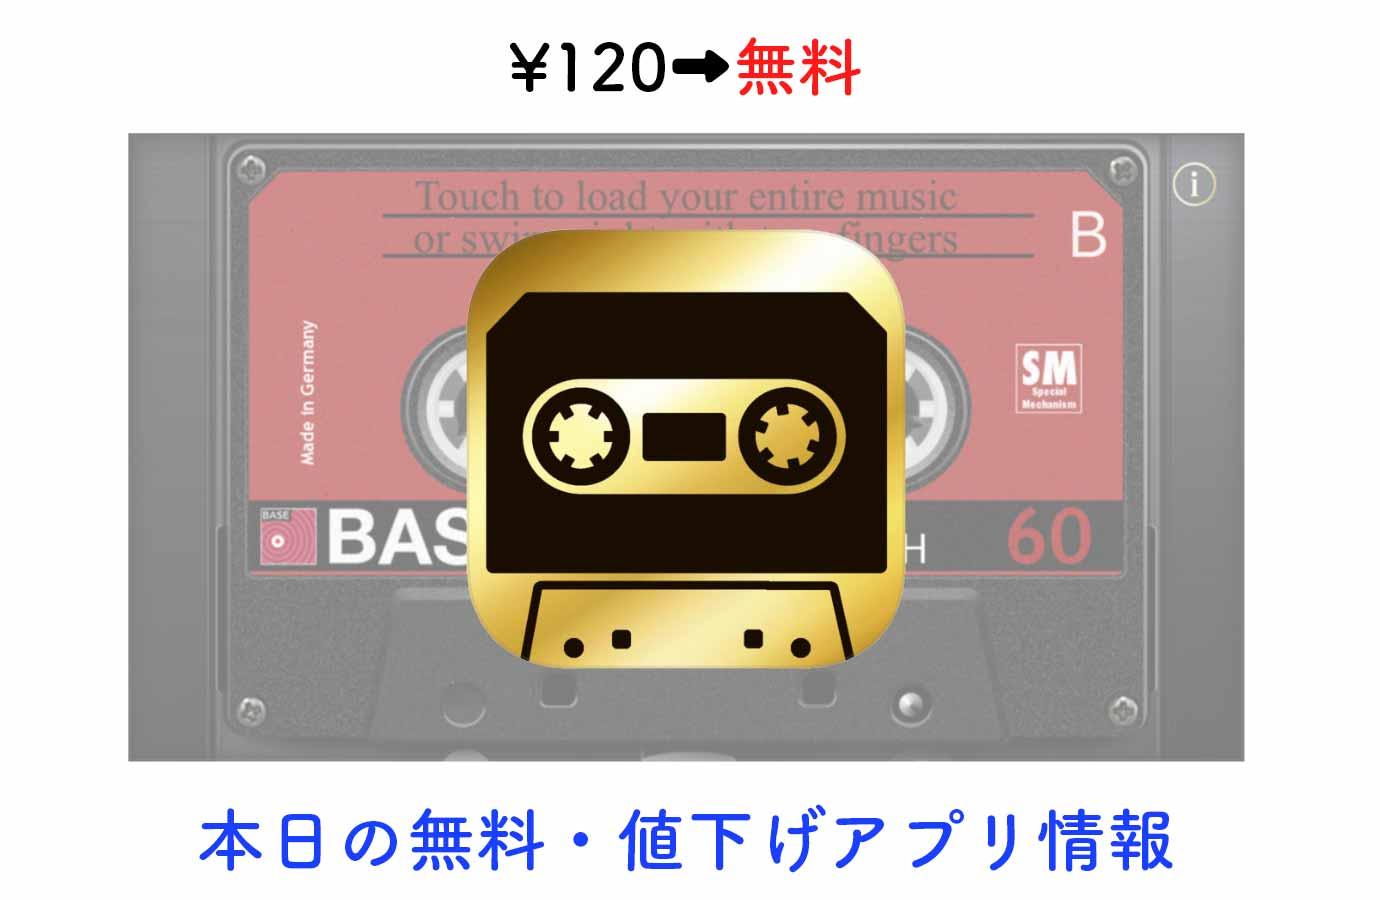 Appsale0721